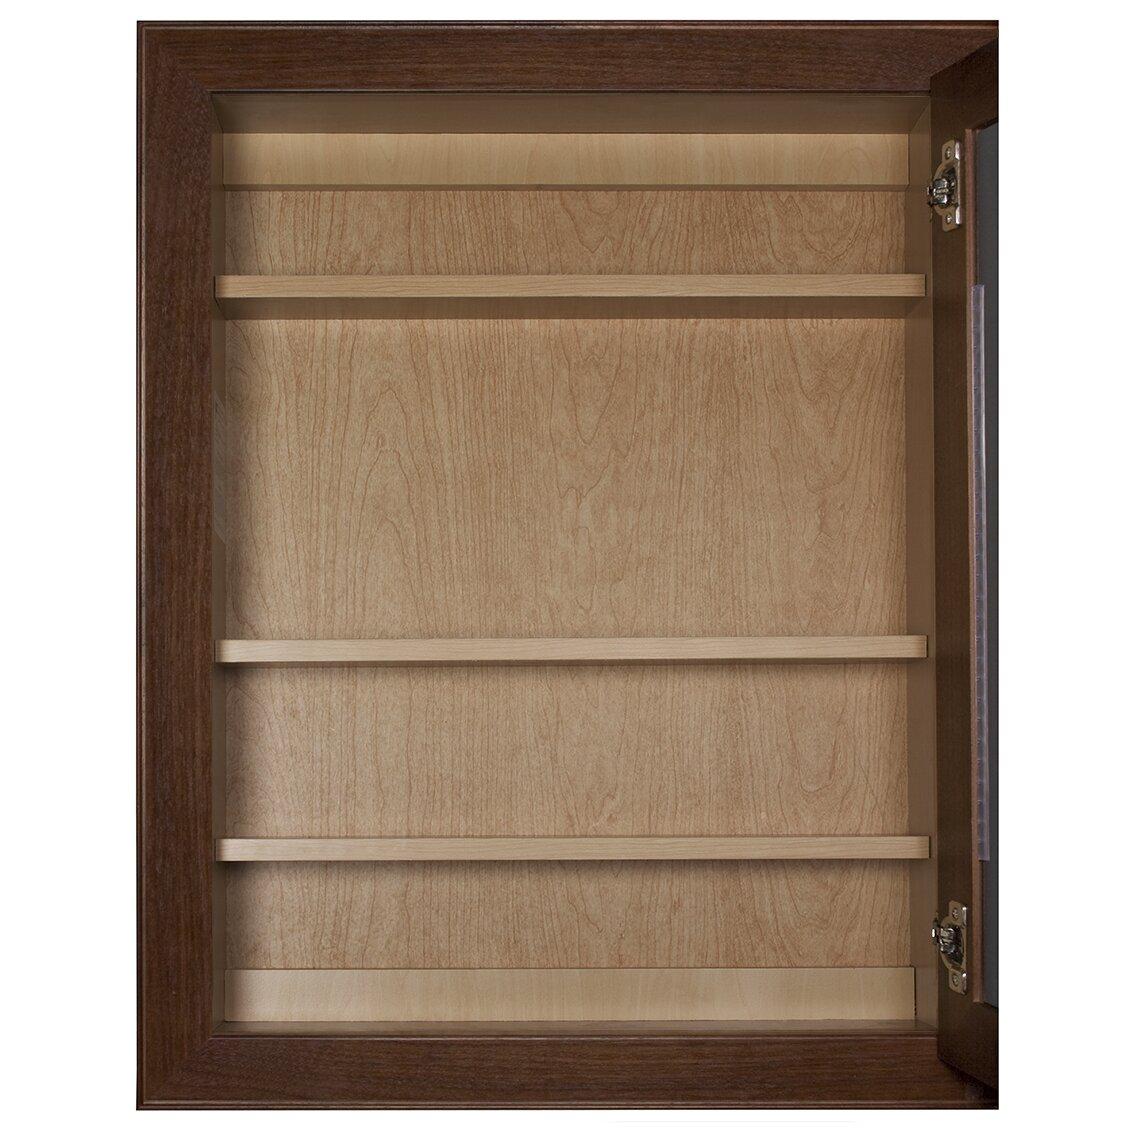 Coastal Collection Bostonian Series 24 X 30 Beveled Edge Medicine Cabinet Reviews Wayfair